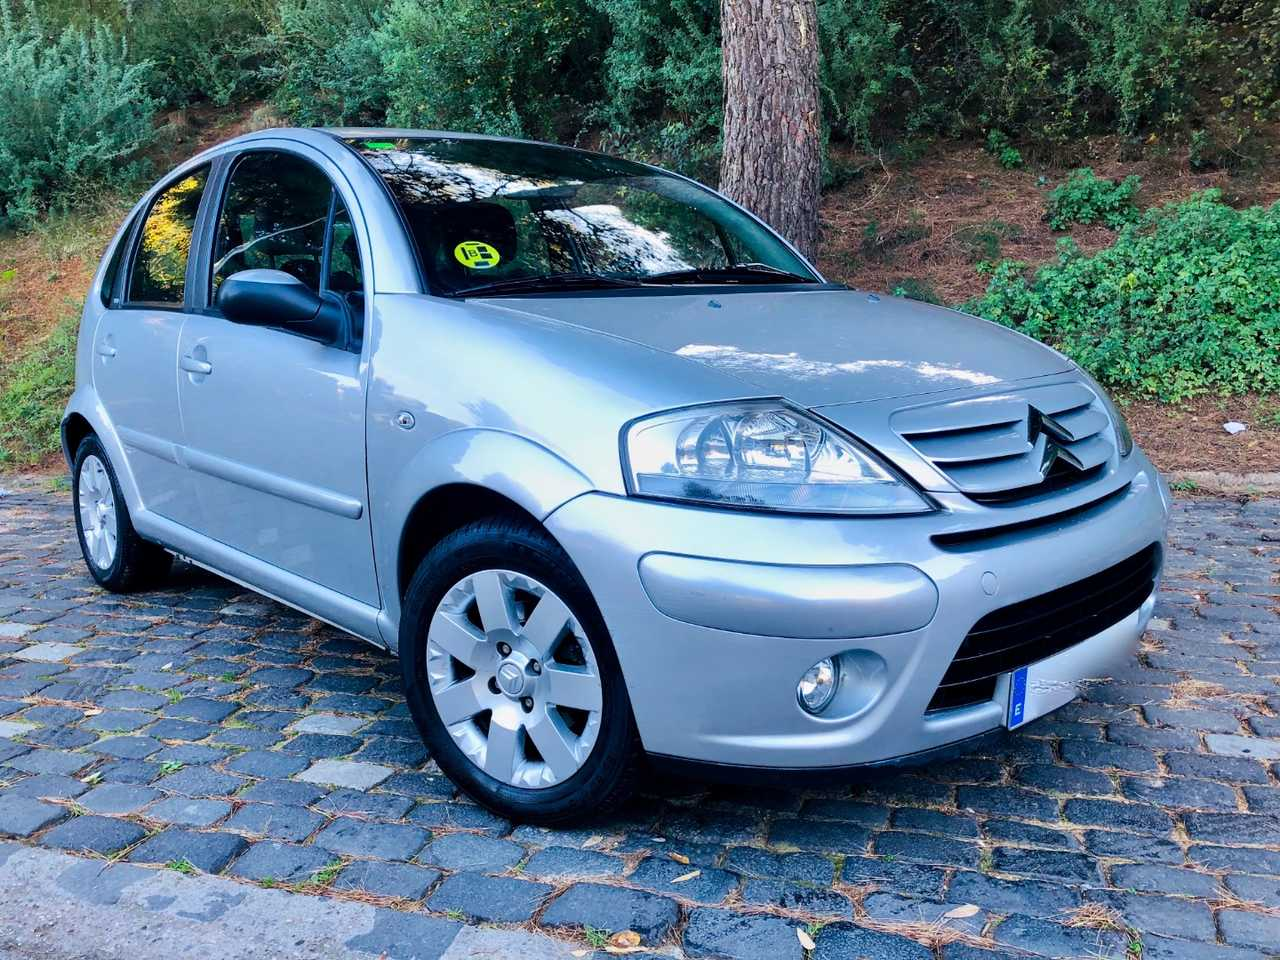 Citroën C3 1.4 Hdi SensoDrive Exclusive. Recomendado. Impecable.   - Foto 1